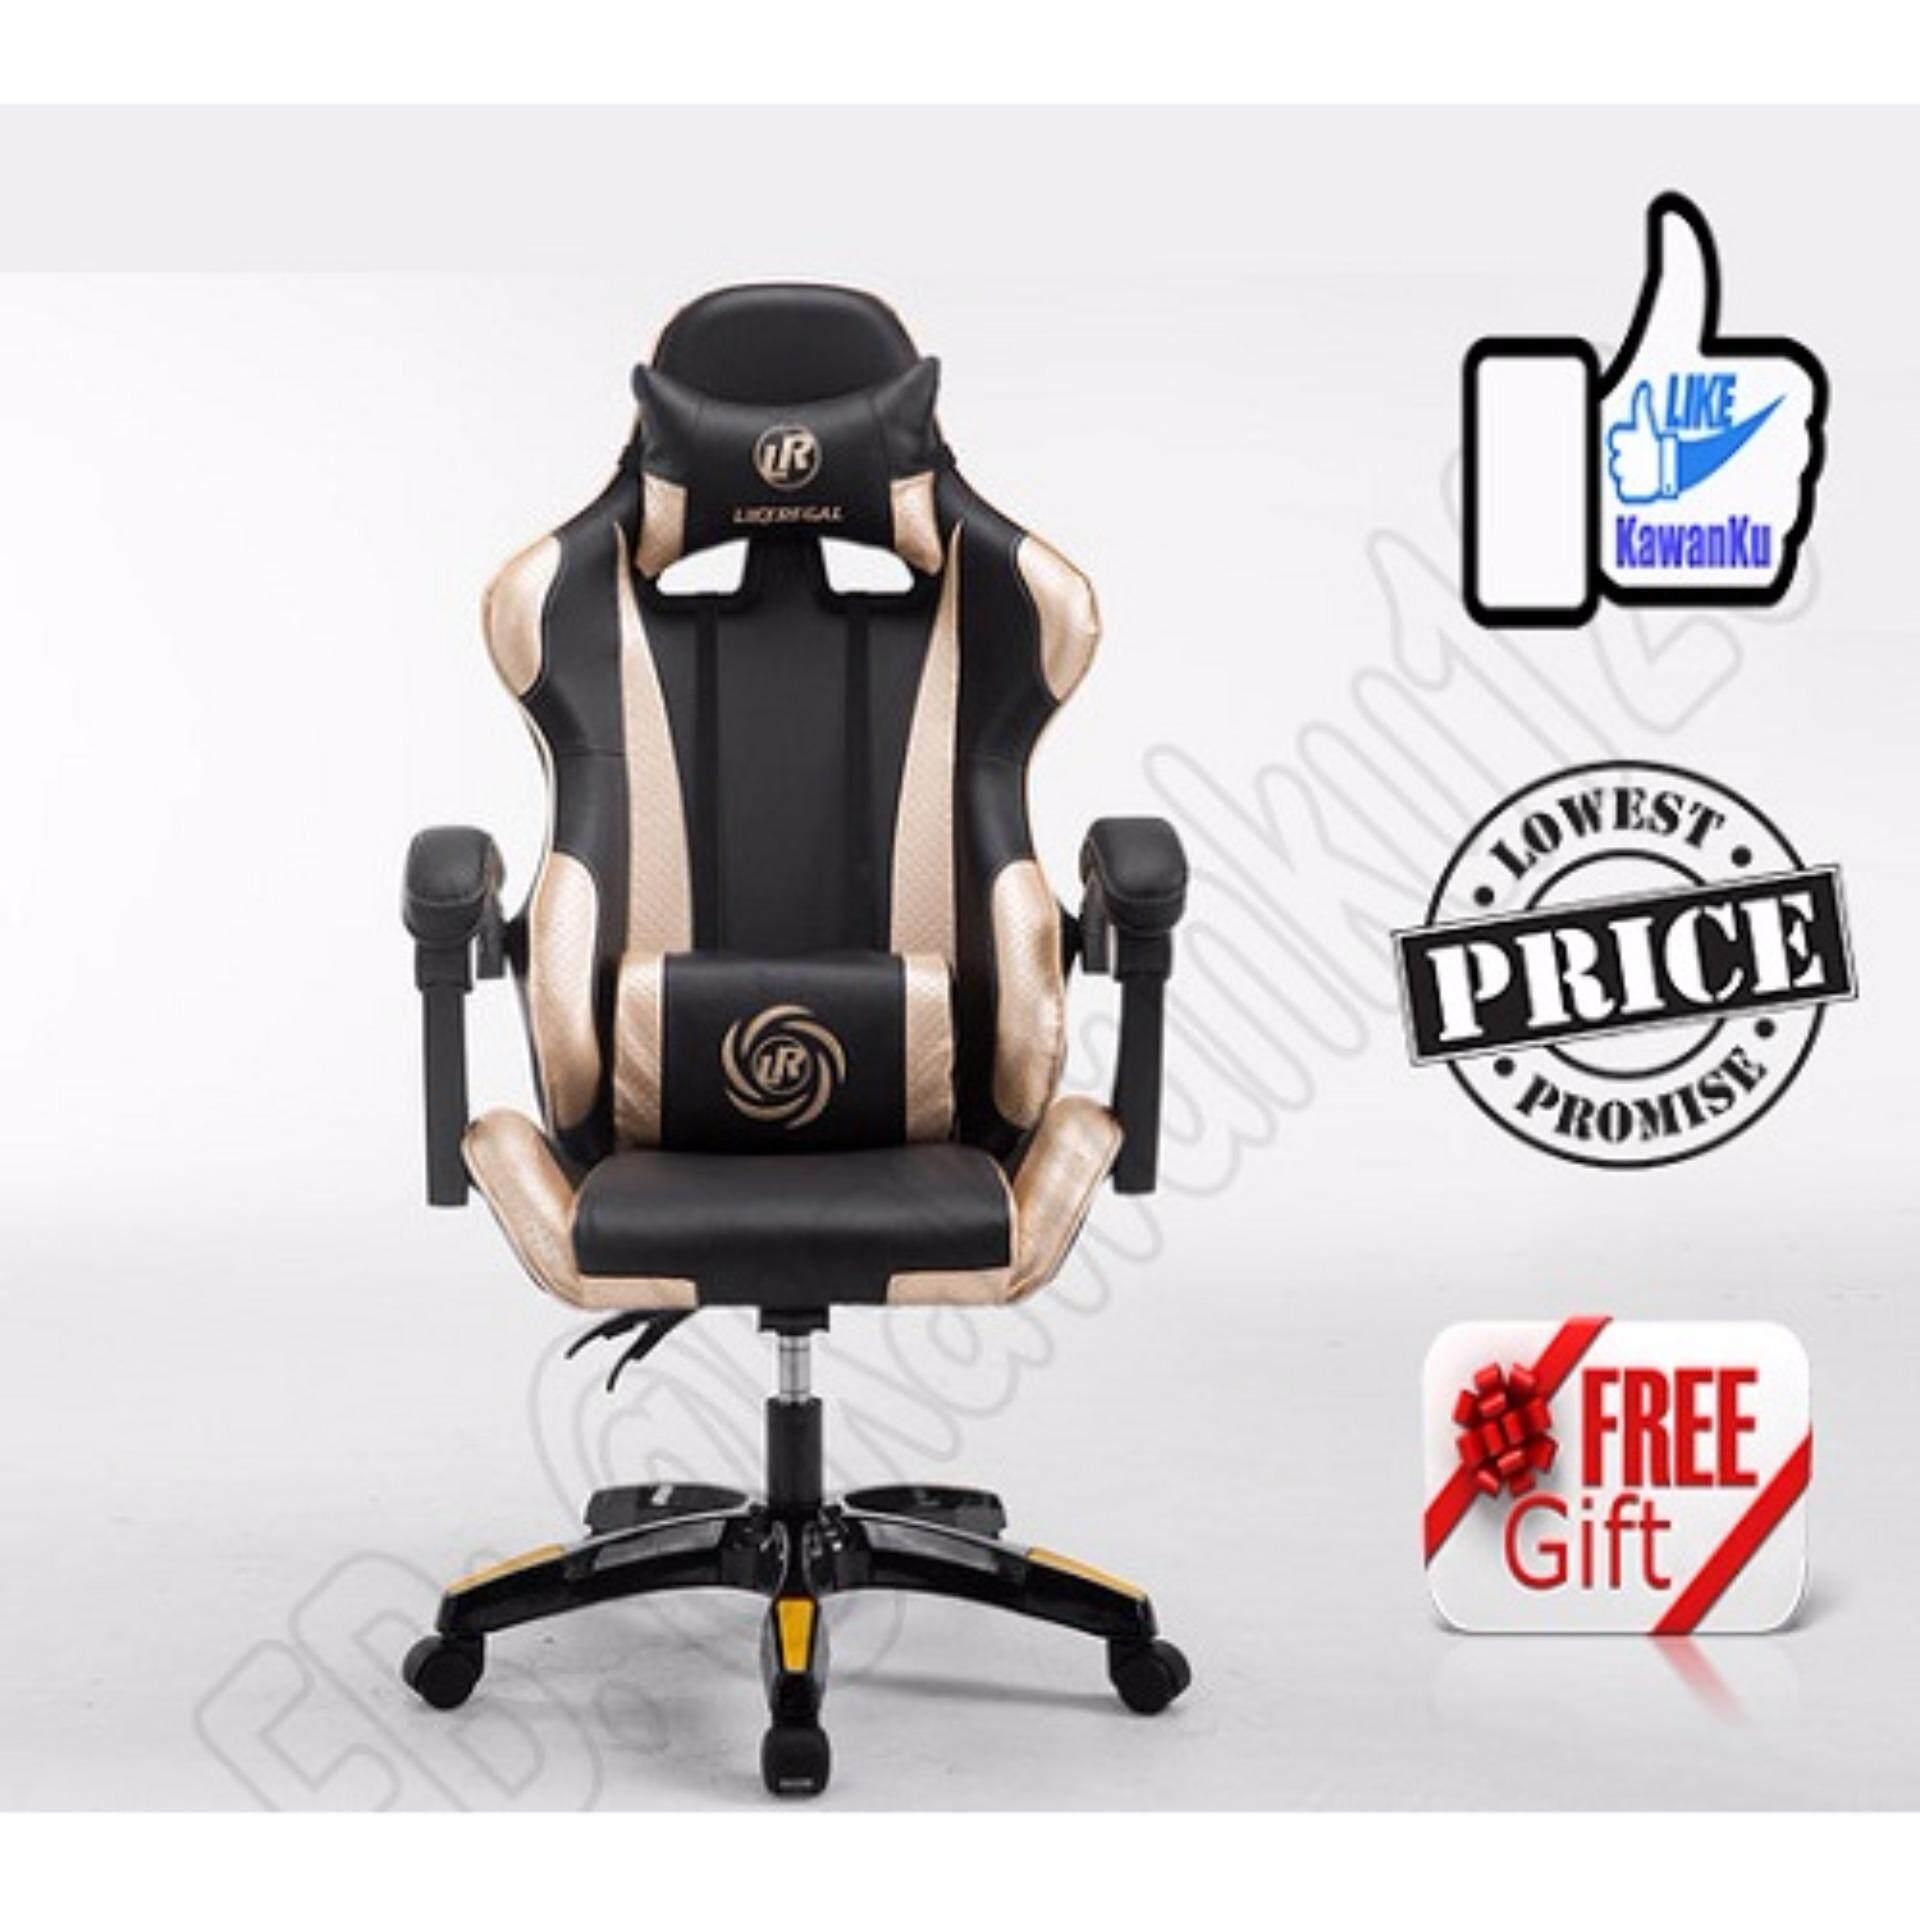 merax back the officechairexpert s guide gaming cheap buyers tilt good high has pc chair com office price a buyer